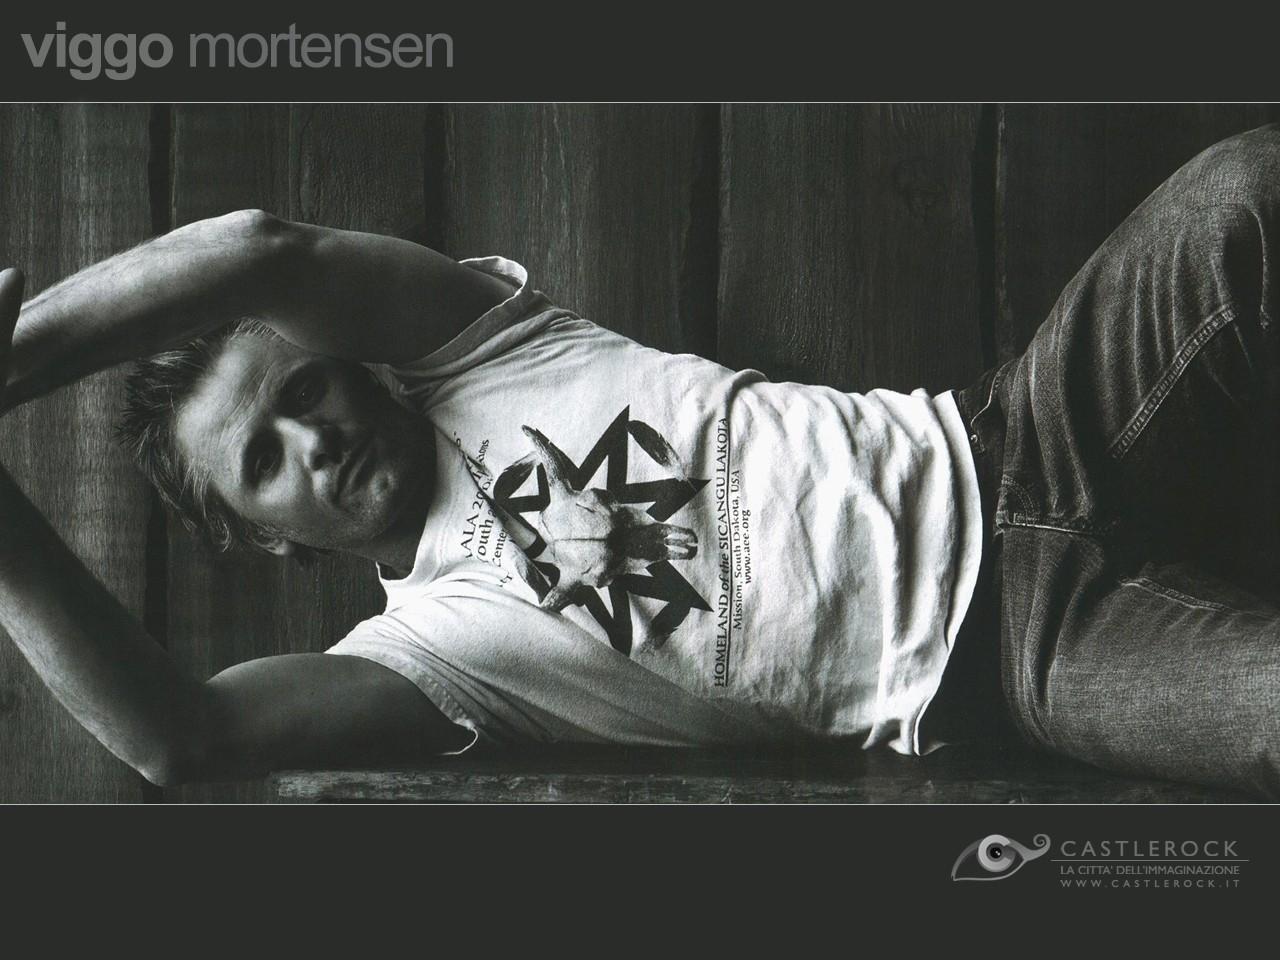 Wallpaper di Viggo Mortensen